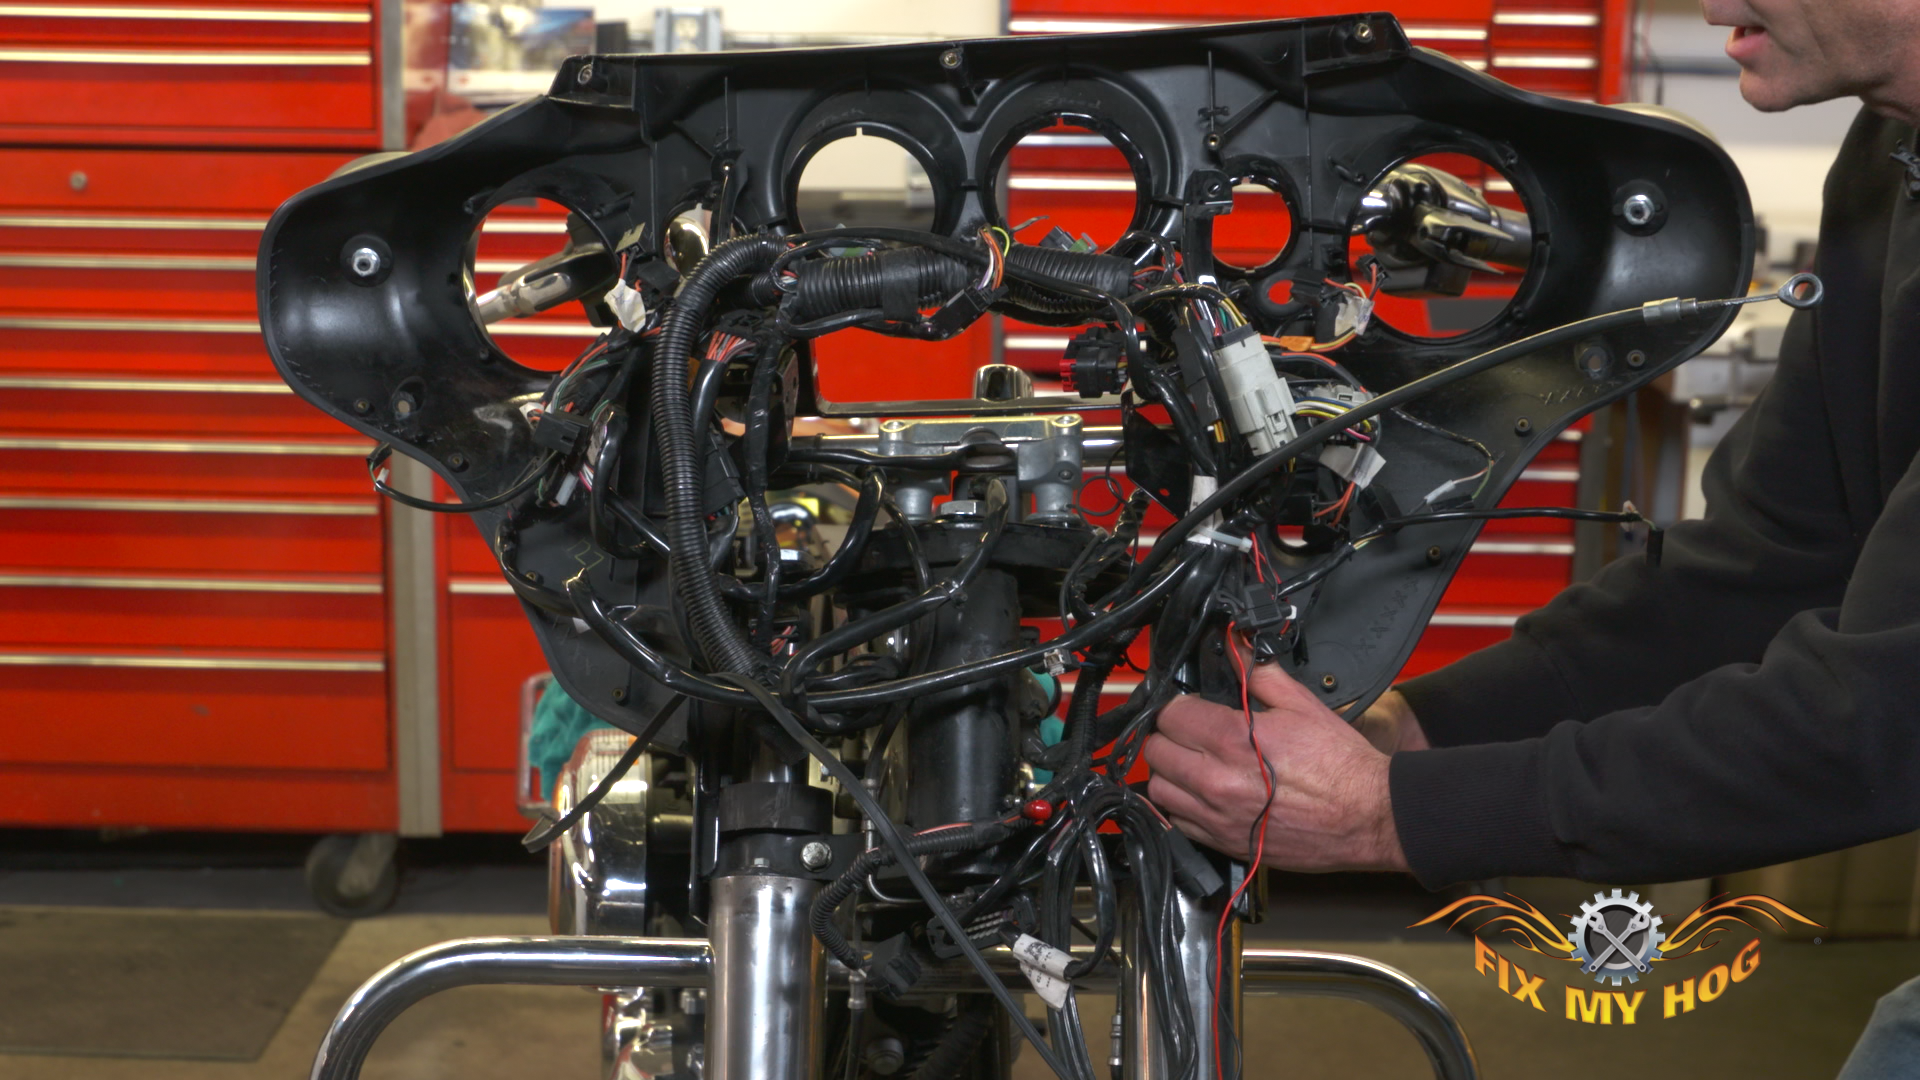 FMH-013633f_Y0E27U_c-Inner-Fairing-Removal-Part-2 Harley Davidson Flh Wiring Diagram on